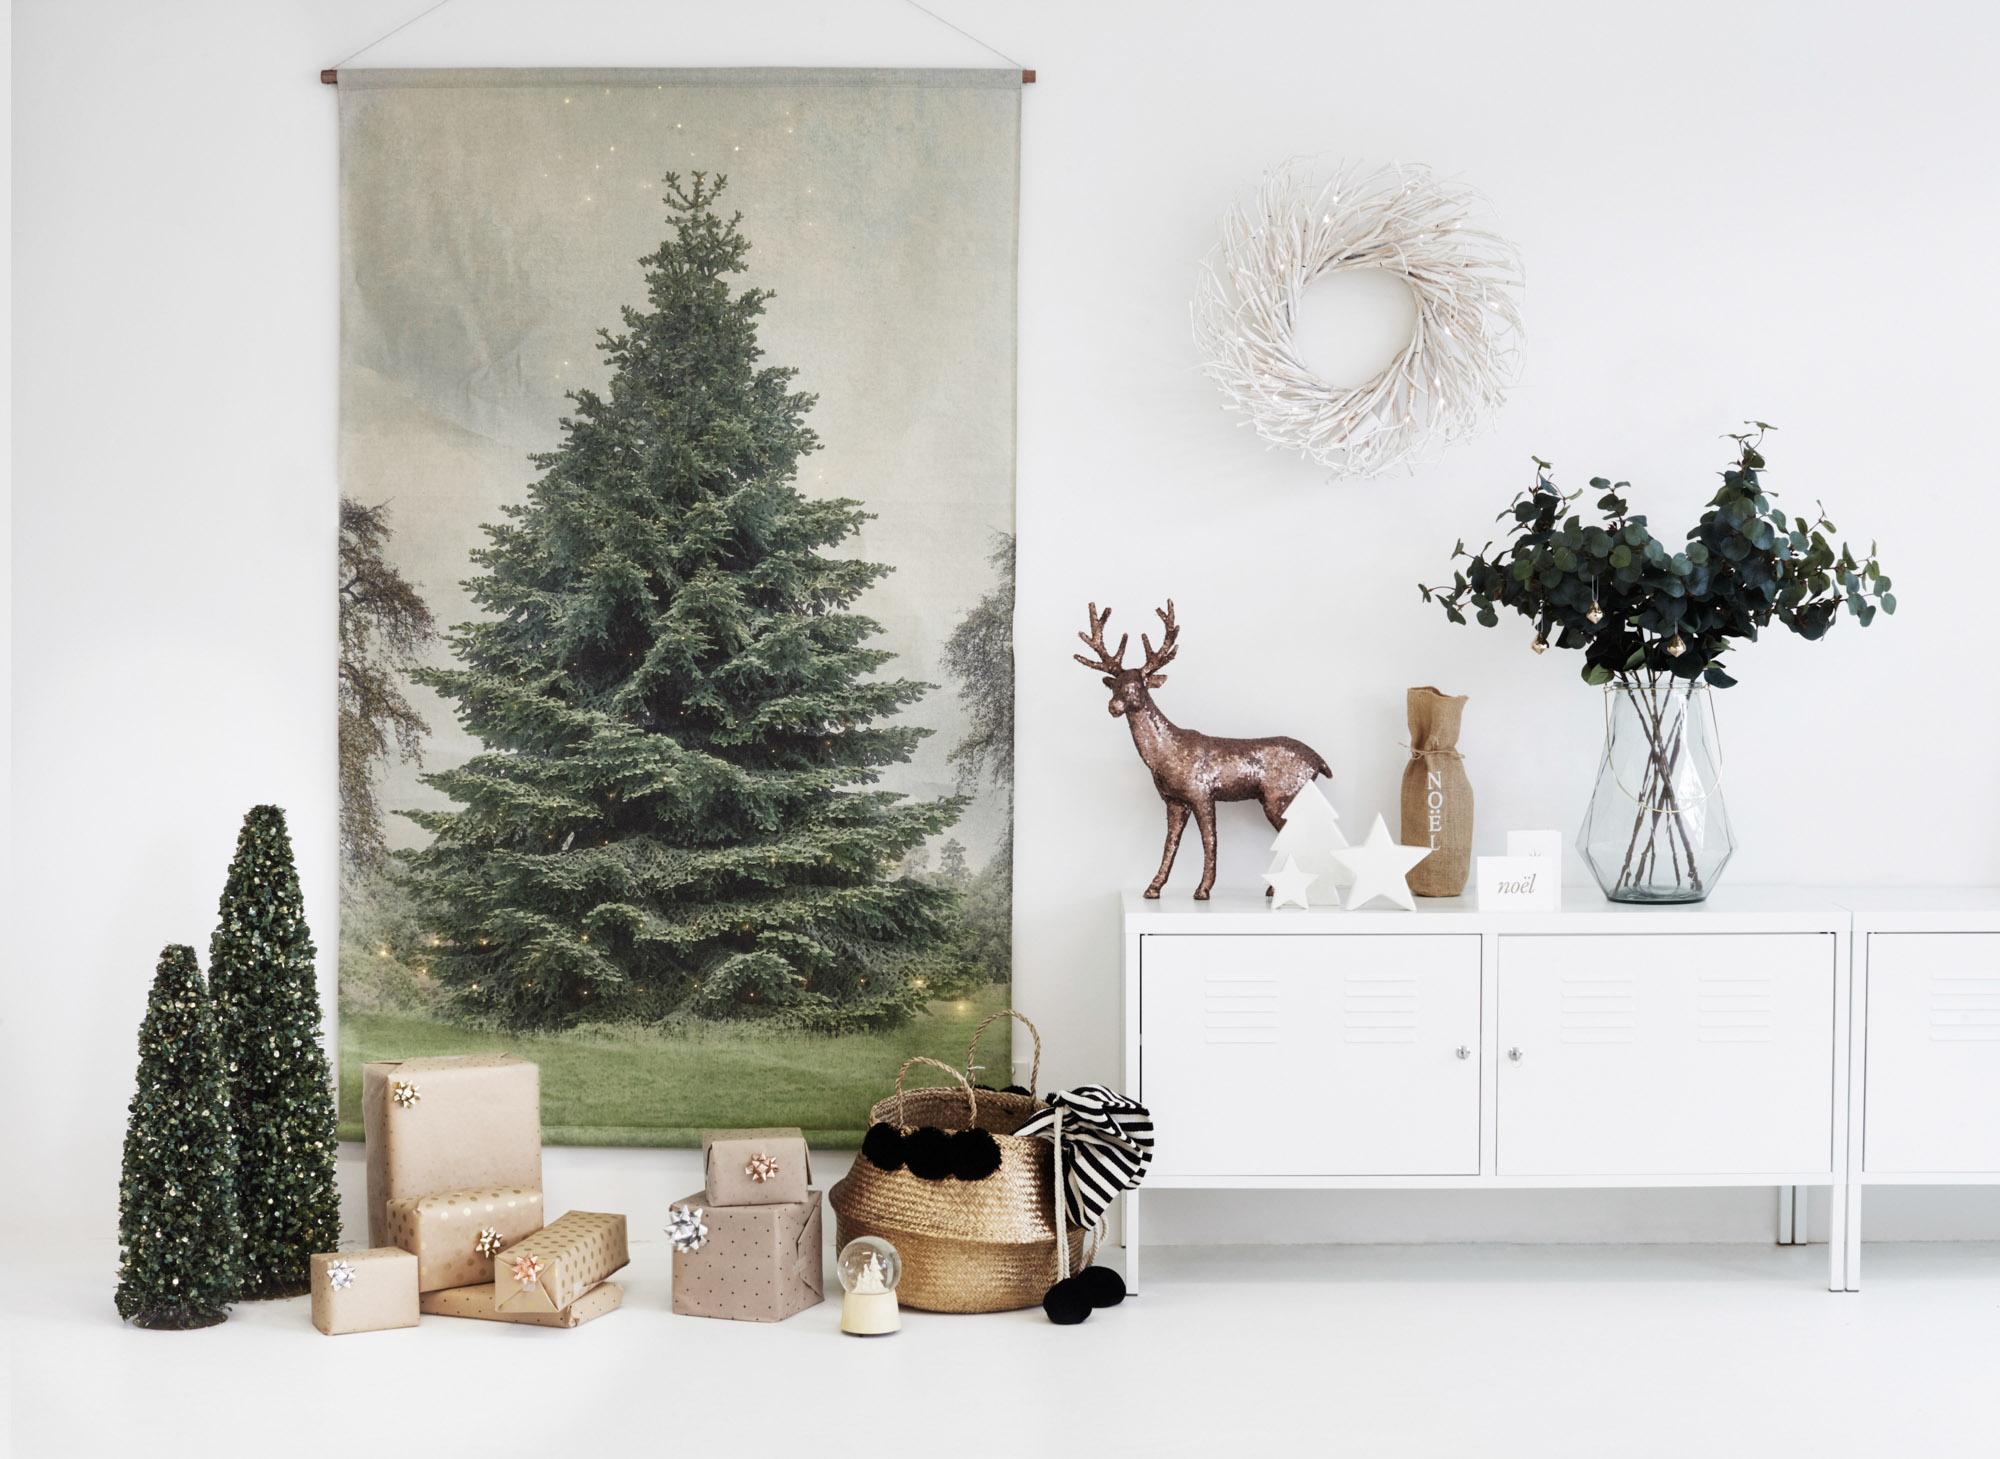 CHRISTMAS CHART, BASKET + CHRISTMAS STOCKING, MINI TREES, REINDEER, STARS, FAUX LEAVES -  HAMPTONS AT HOME  VASE - WEST ELM CABINET - IKEA